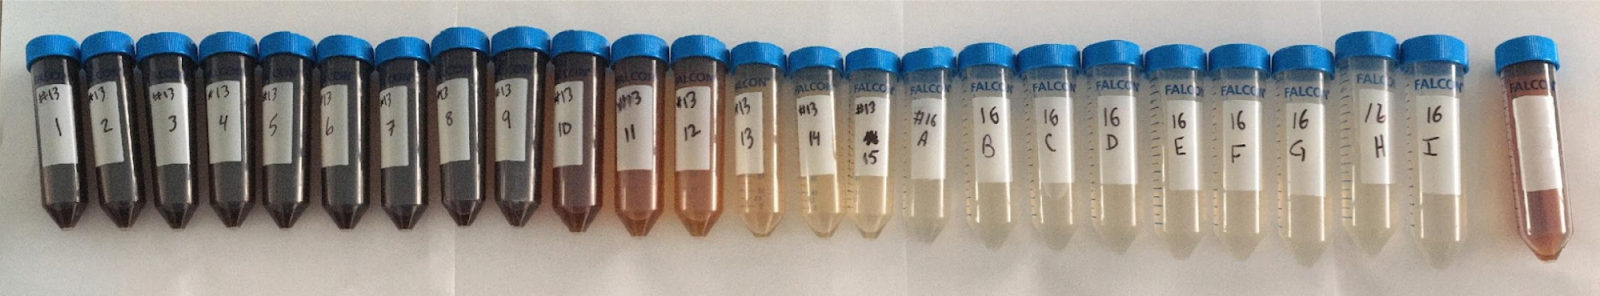 Urine freeze-thaw vials